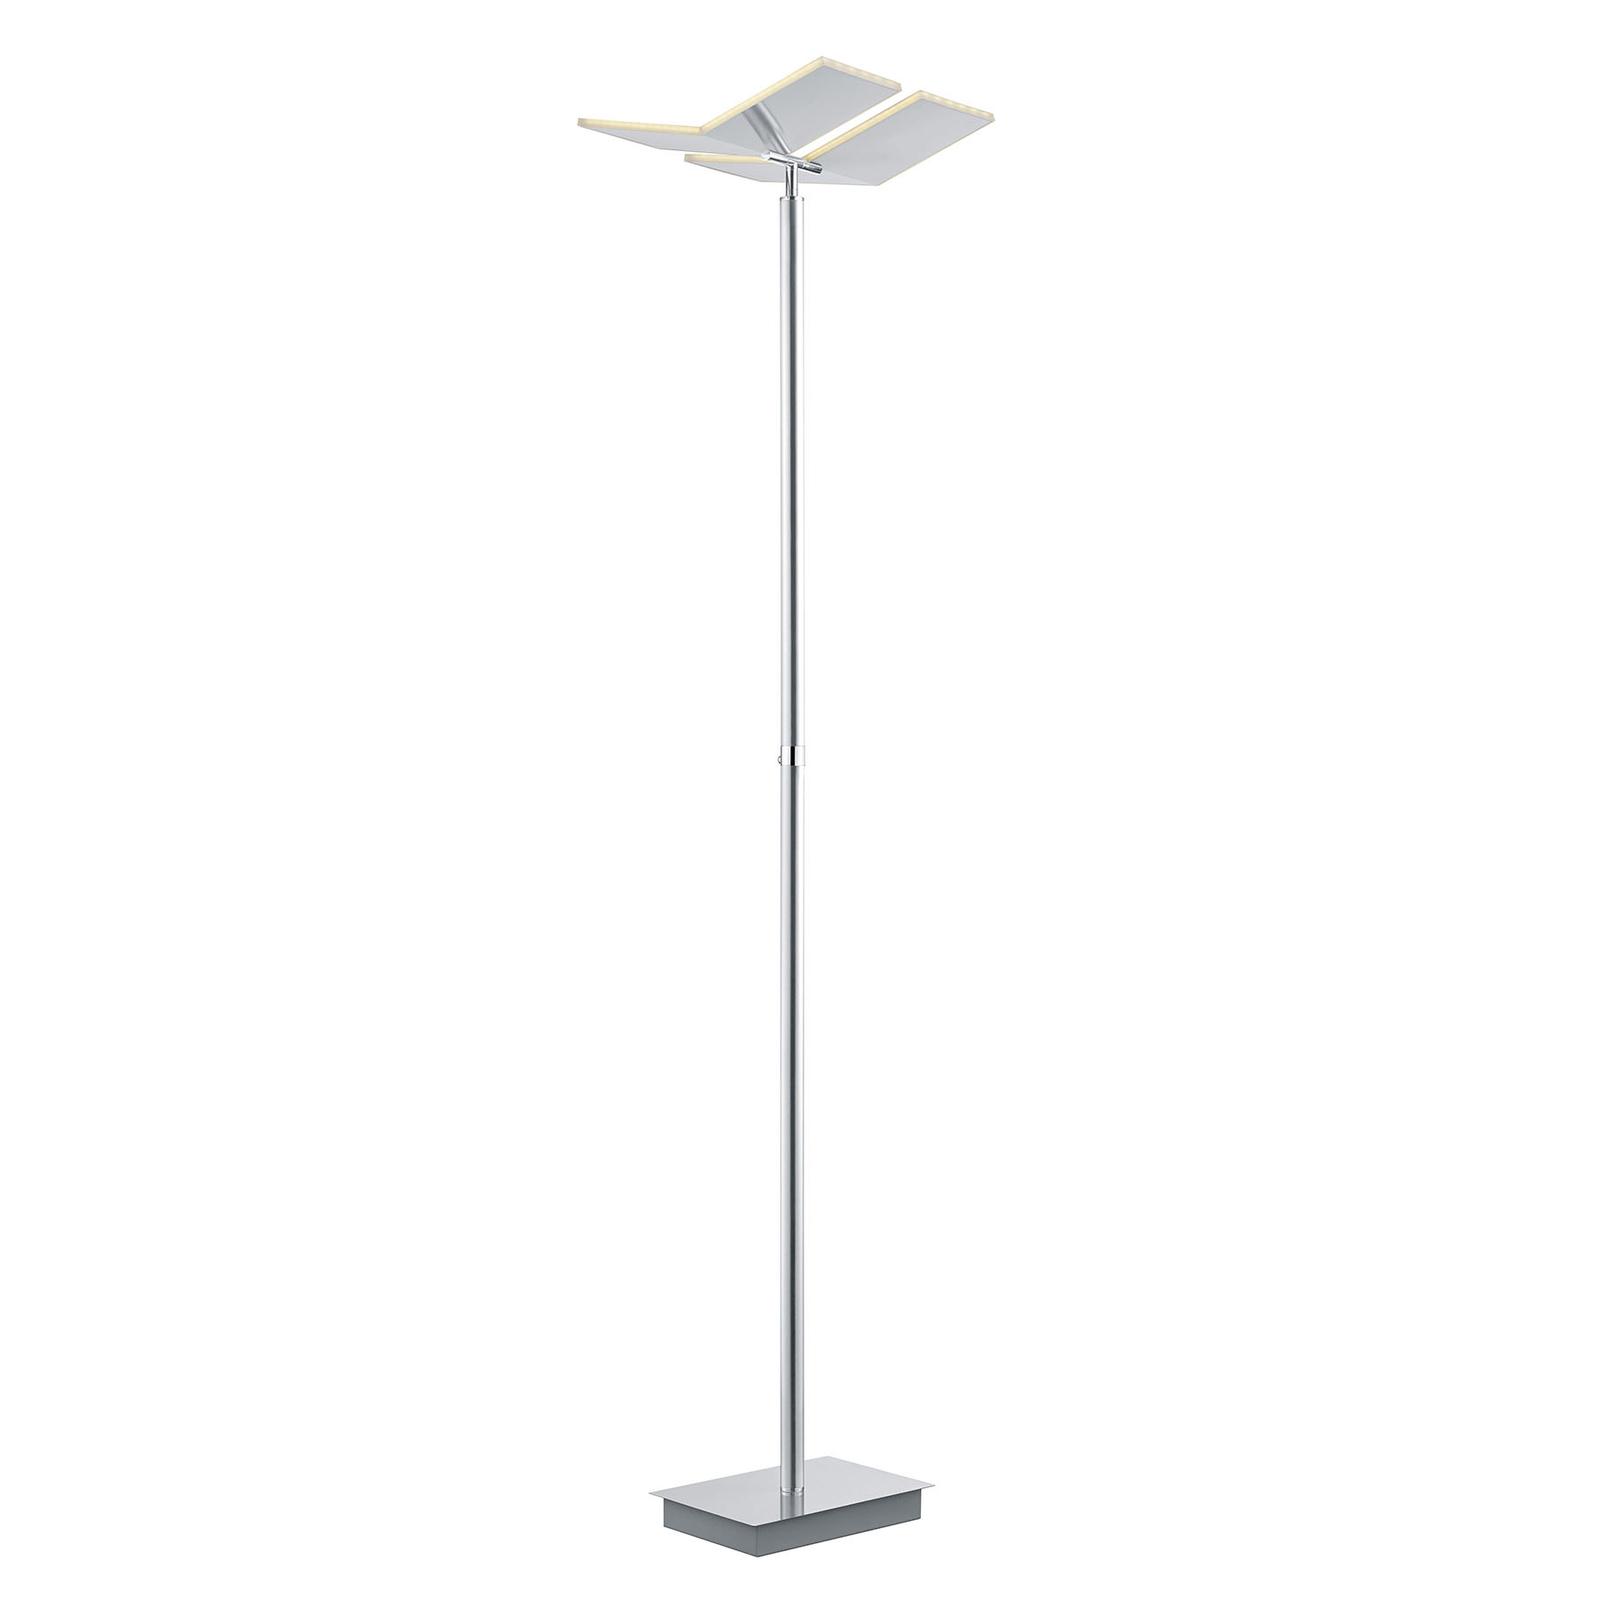 B-Leuchten Domi lampa stojąca LED, nikiel